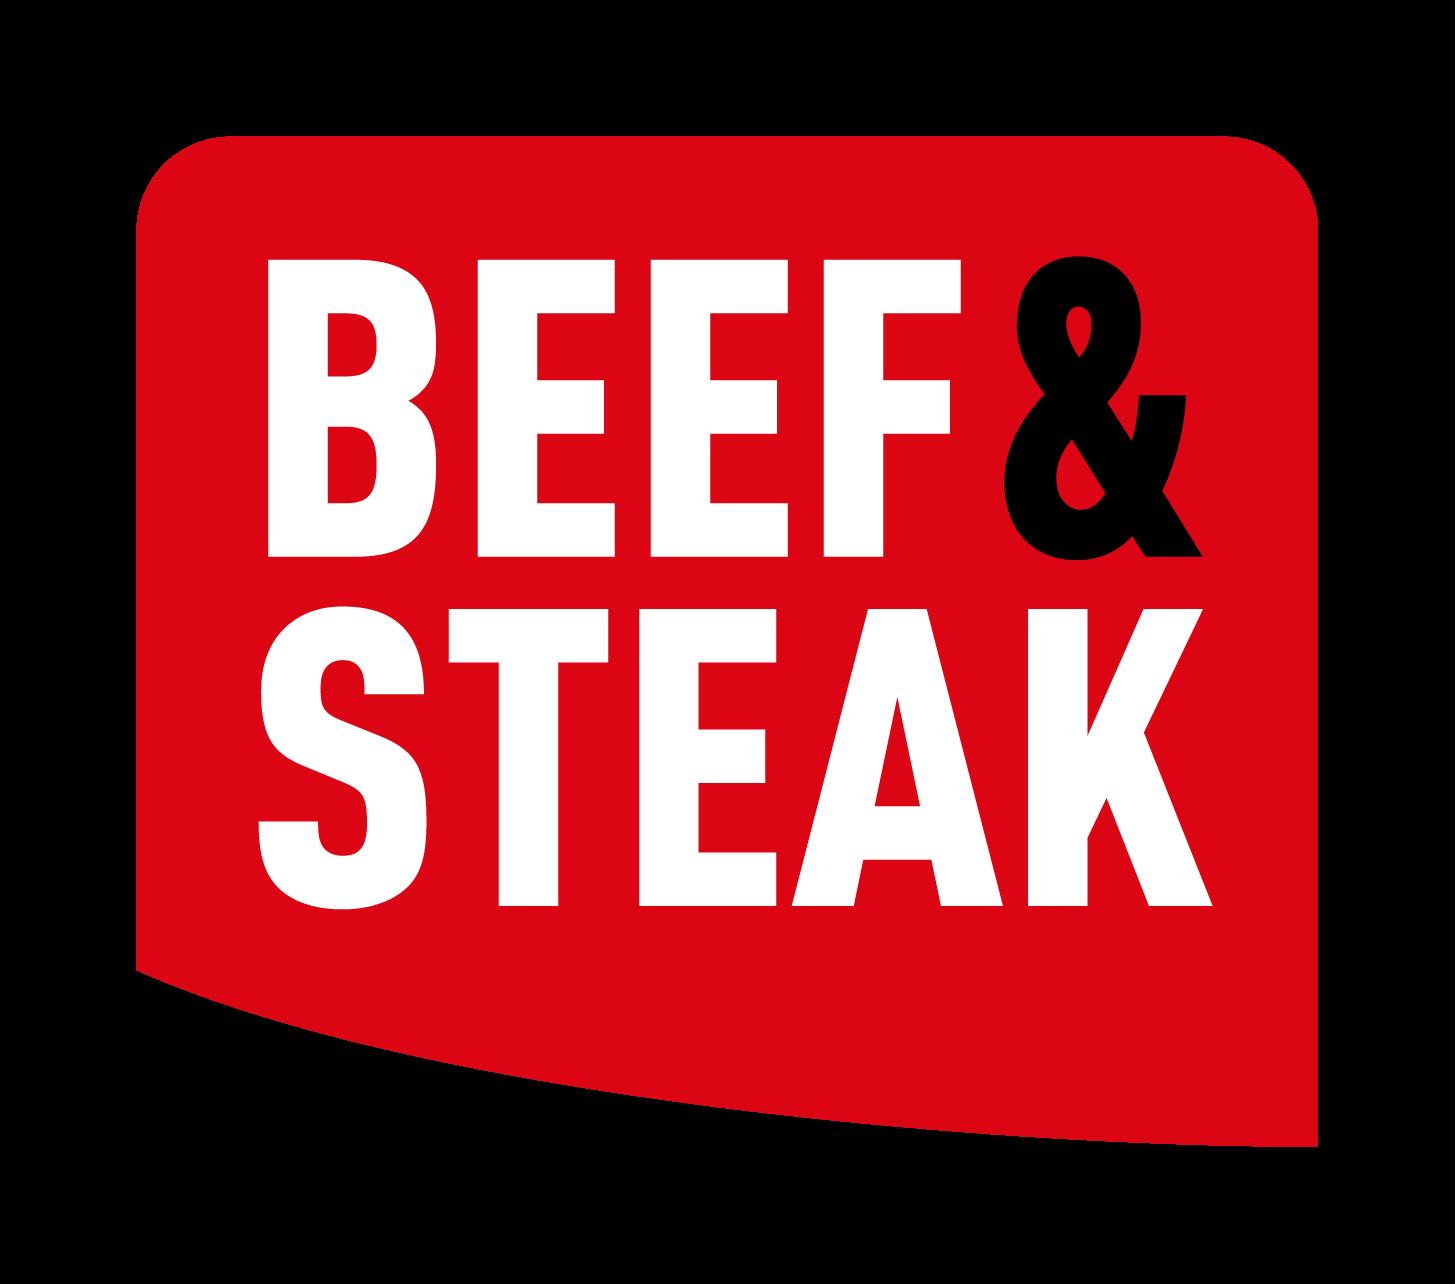 aberdeen-angus-rib-eye-steak